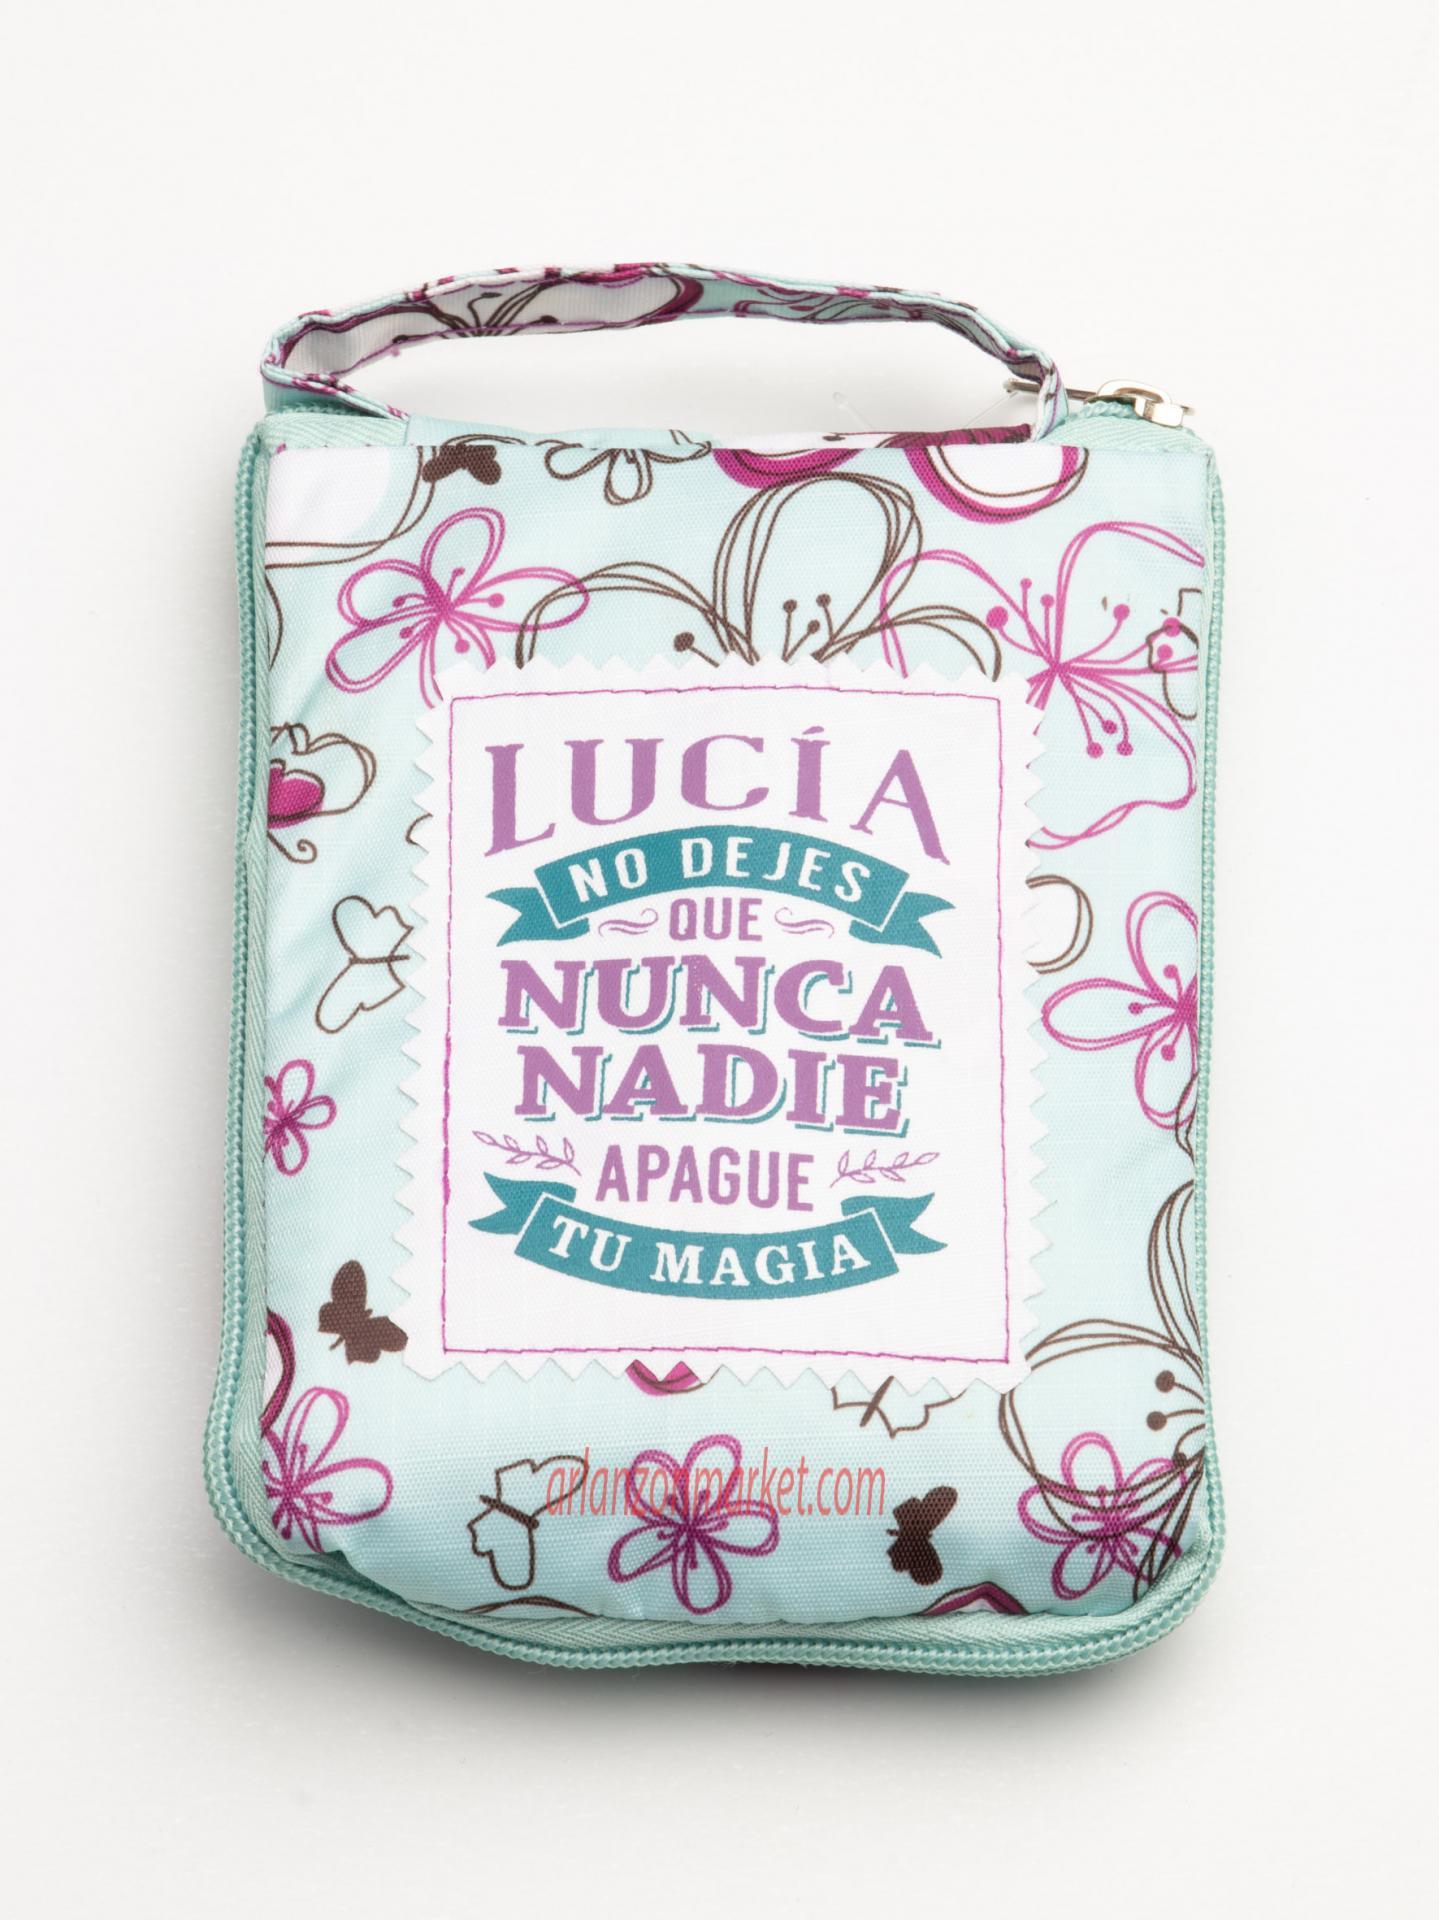 Bolsa con mensaje  LUCIA